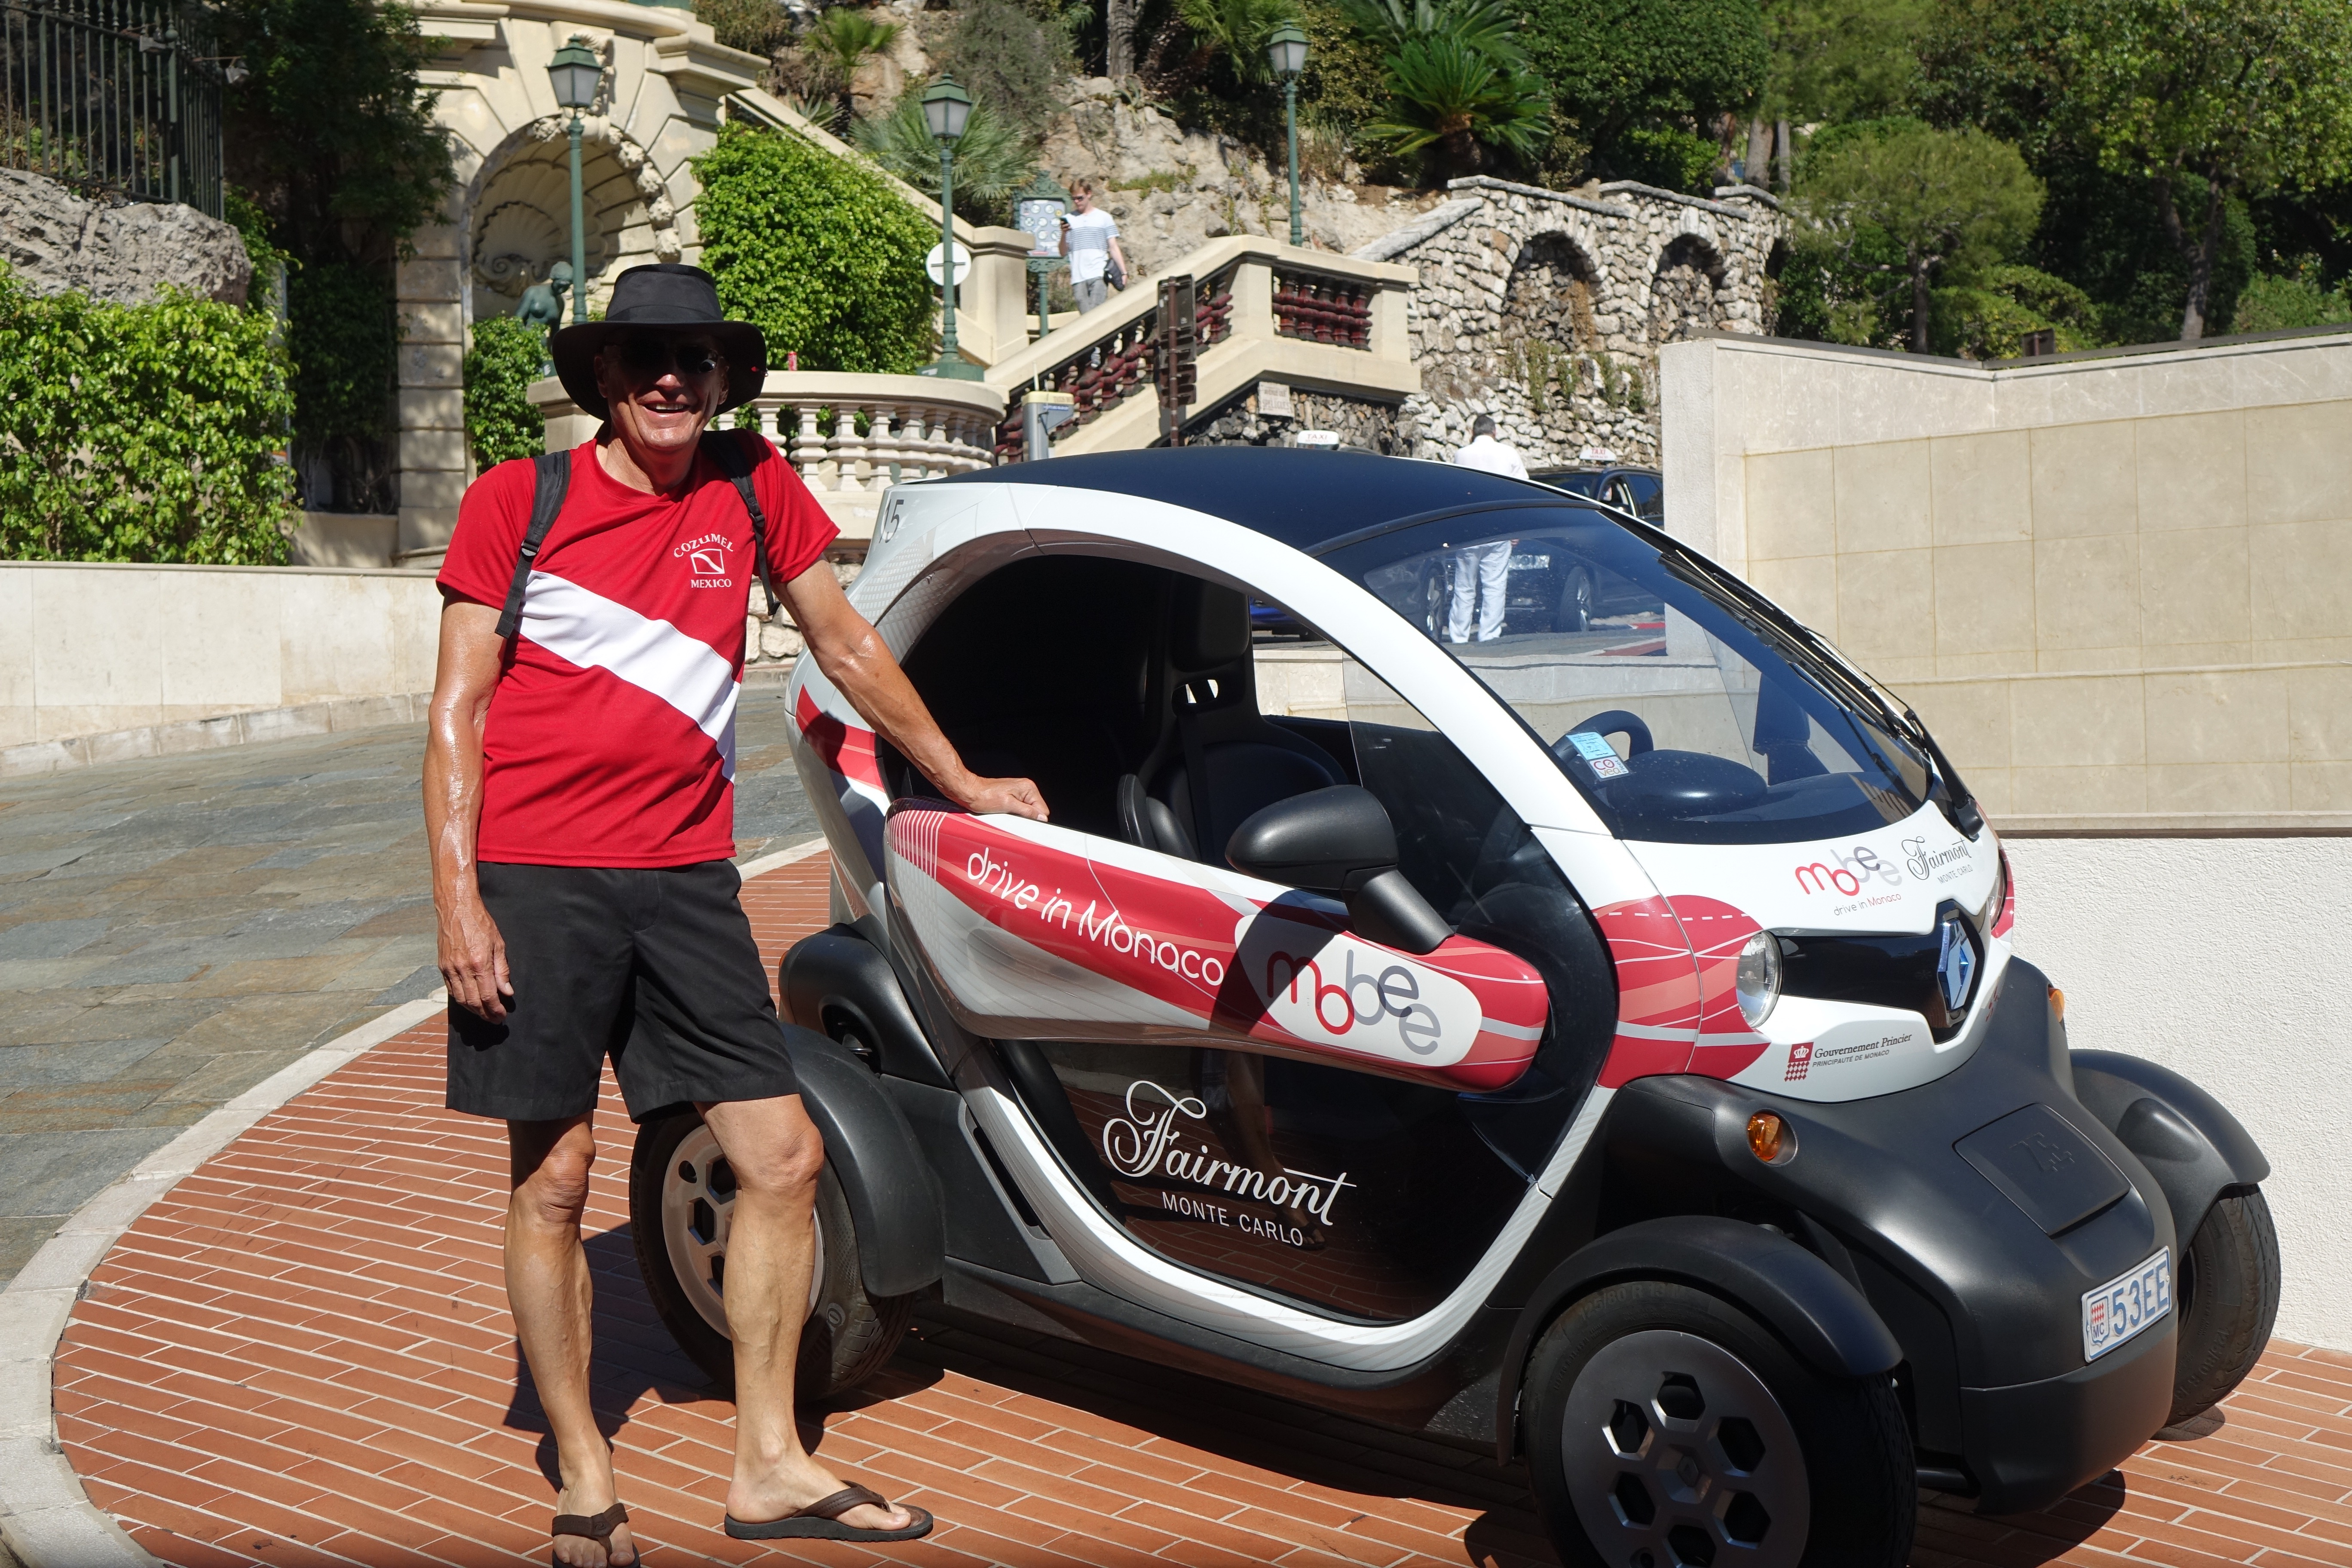 Monaco on the Côte d'Azur - Where are Sue & Mike?